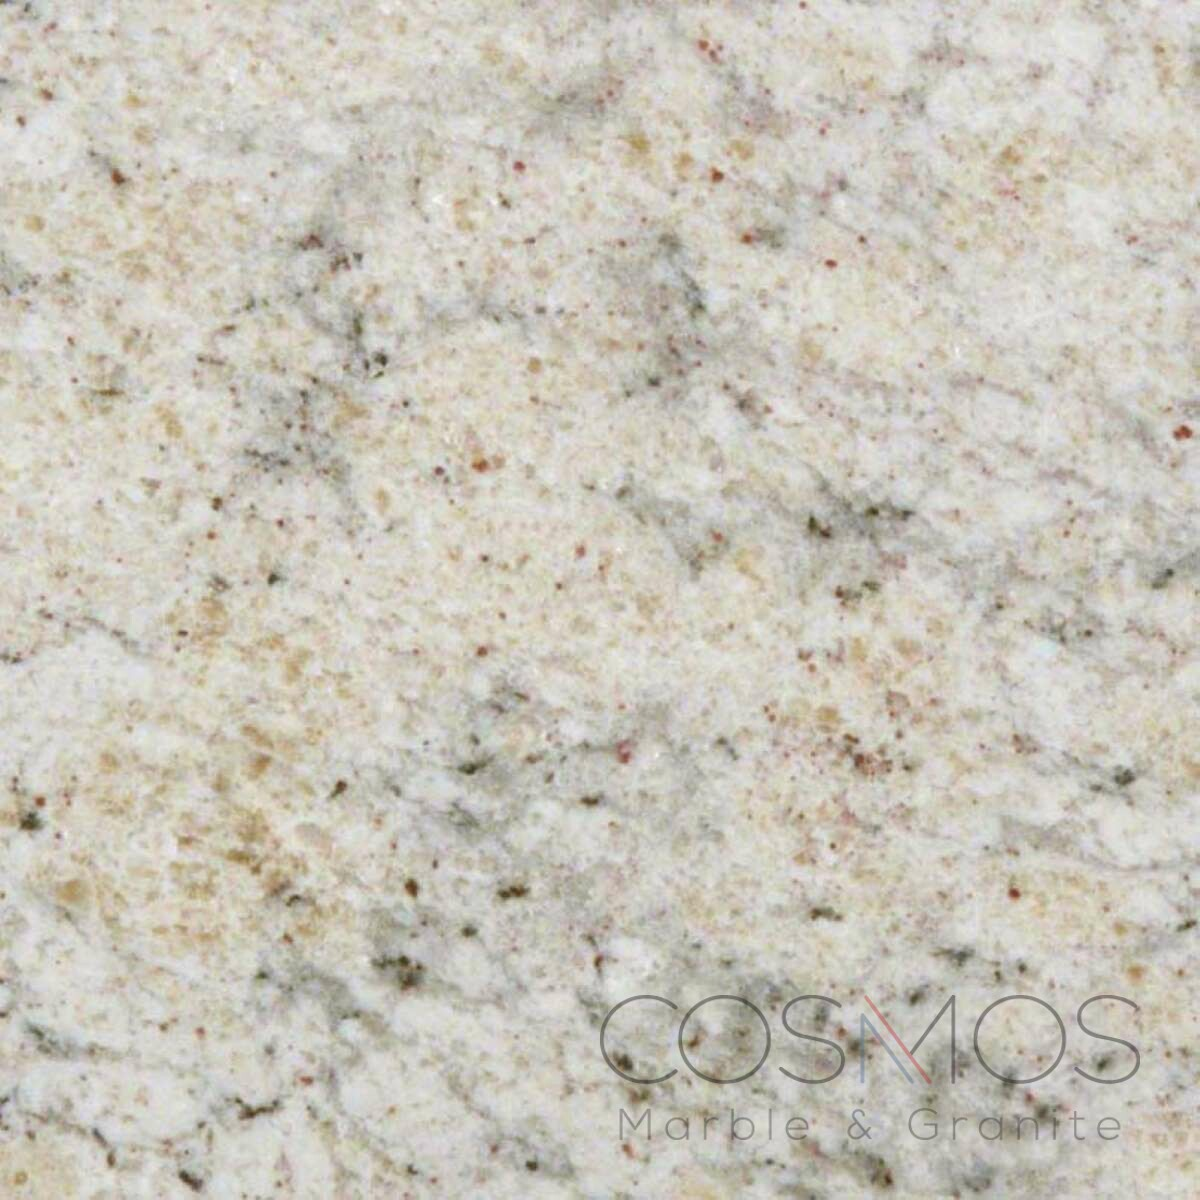 bianco-romano-granite_1